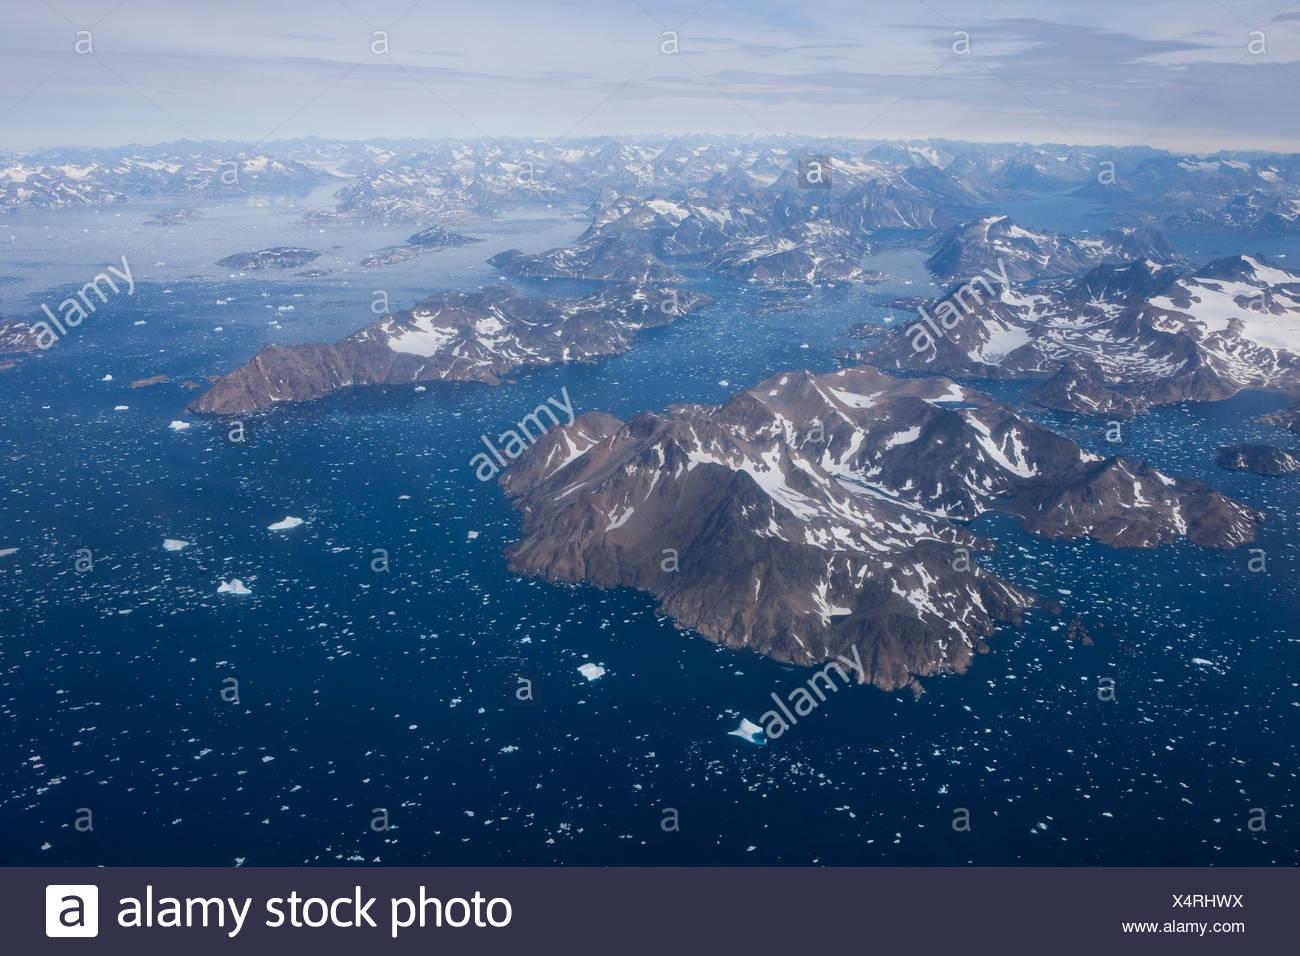 Icebergs, Atlantic, East Greenland, Greenland, sea, mountains, sea - Stock Image